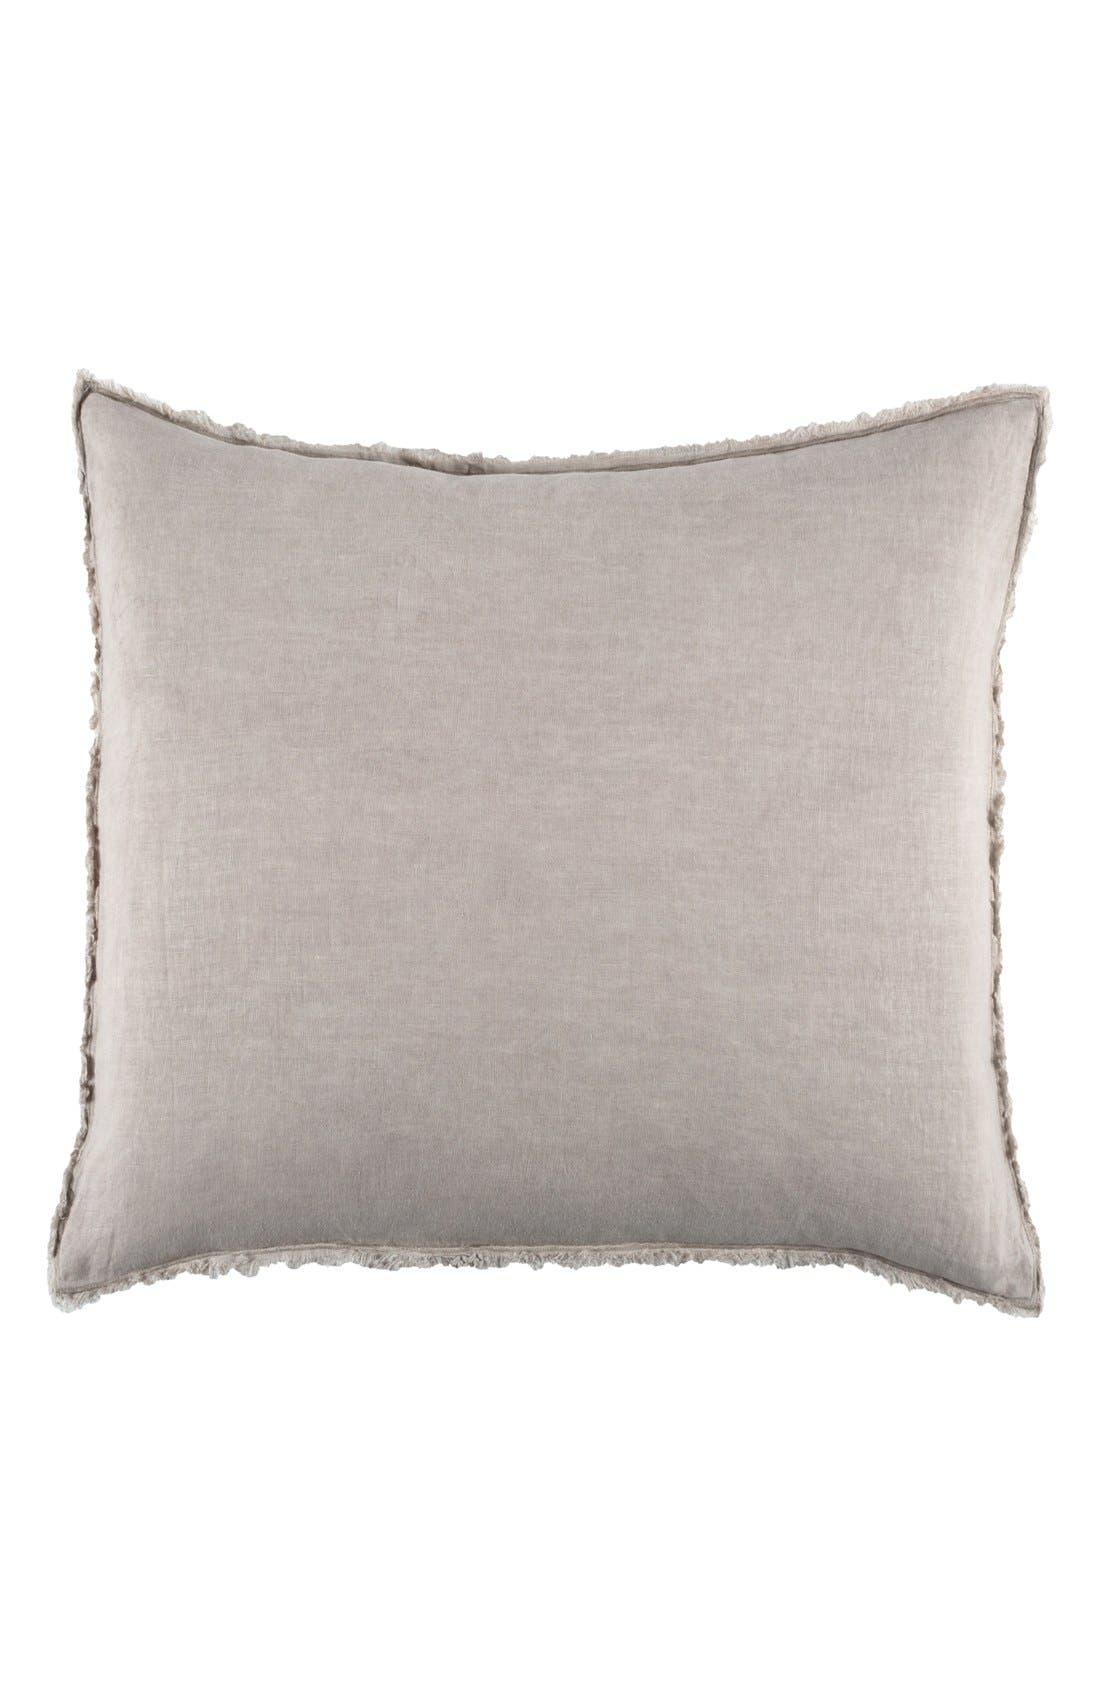 'Blair' Linen Euro Pillow Sham,                         Main,                         color, Taupe